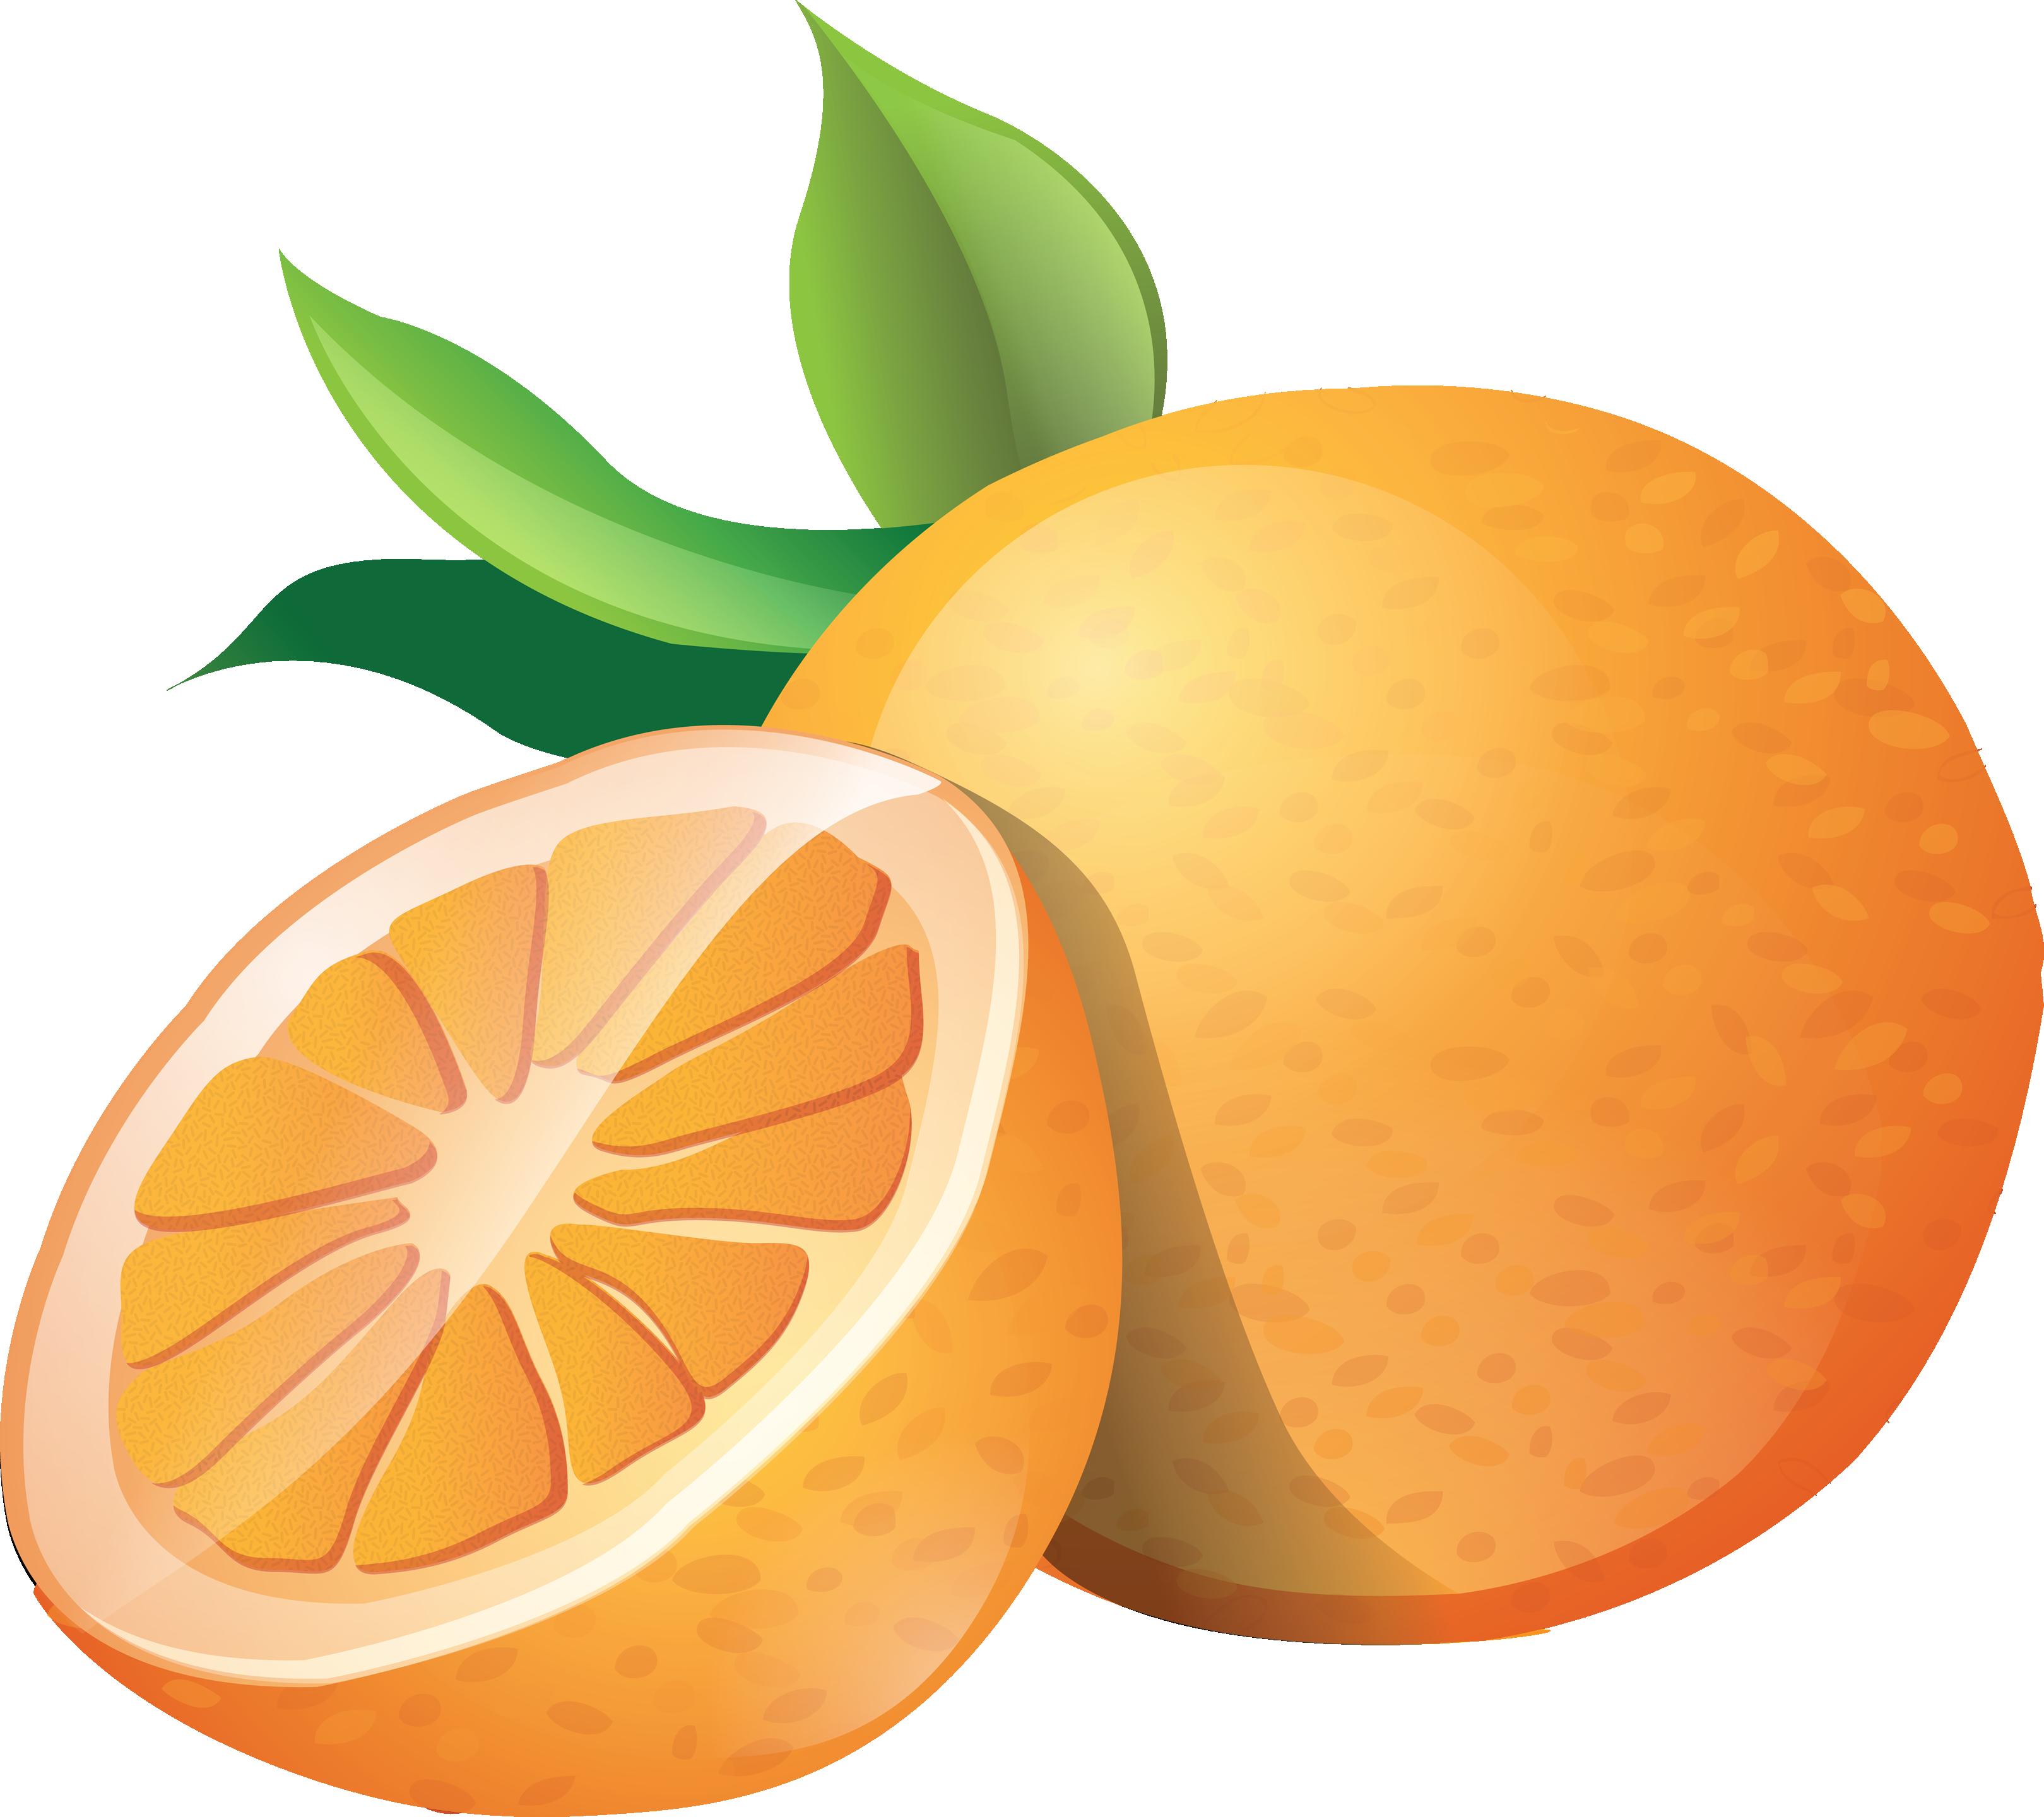 clip art black and white Oranges clipart. Free orange cliparts download